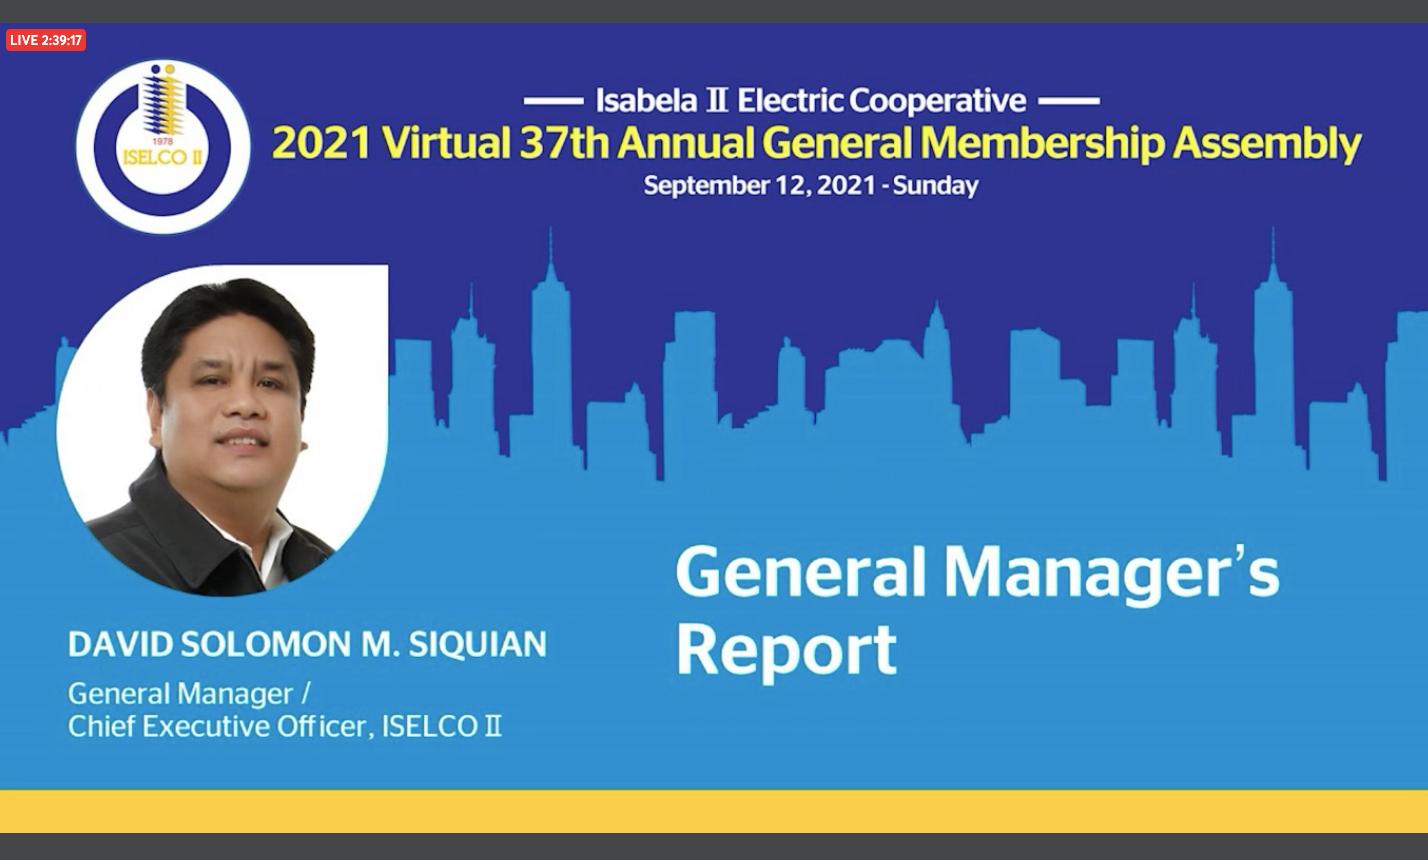 General Manager David Solomon M. Siquian's Report